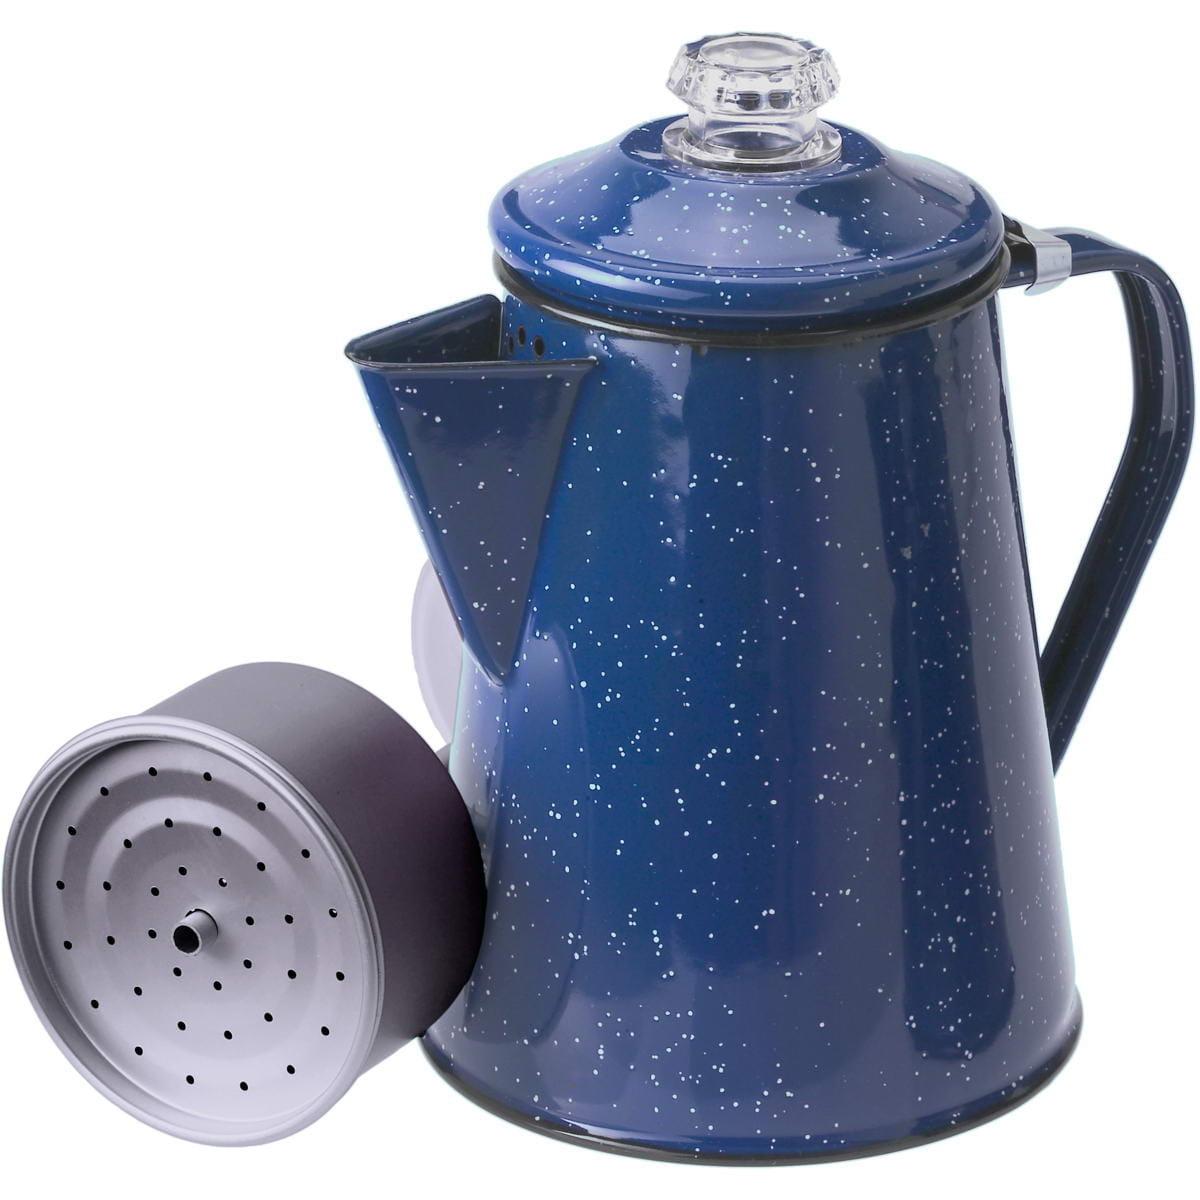 GSI Percolator 8 Cup - Enamel Kaffeekocher blue - Bild 1